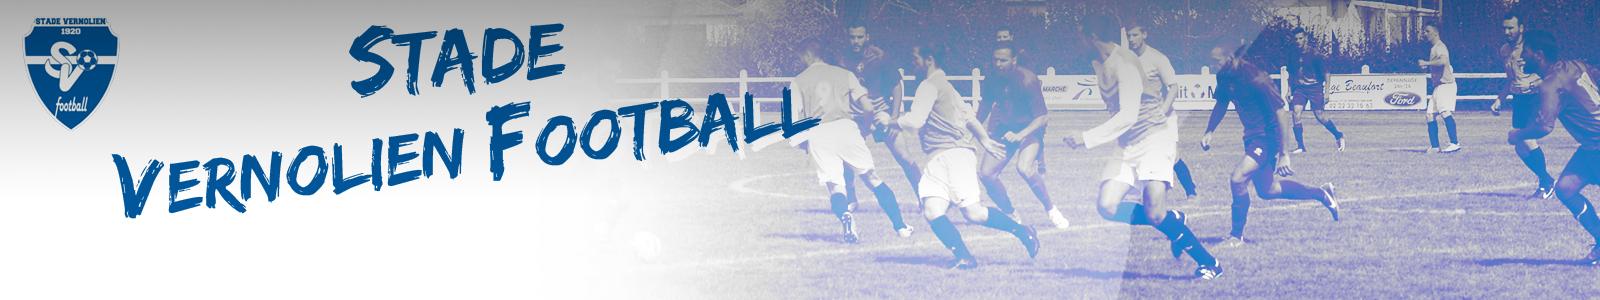 STADE VERNOLIEN FOOTBALL : site officiel du club de foot de VERNEUIL SUR AVRE - footeo